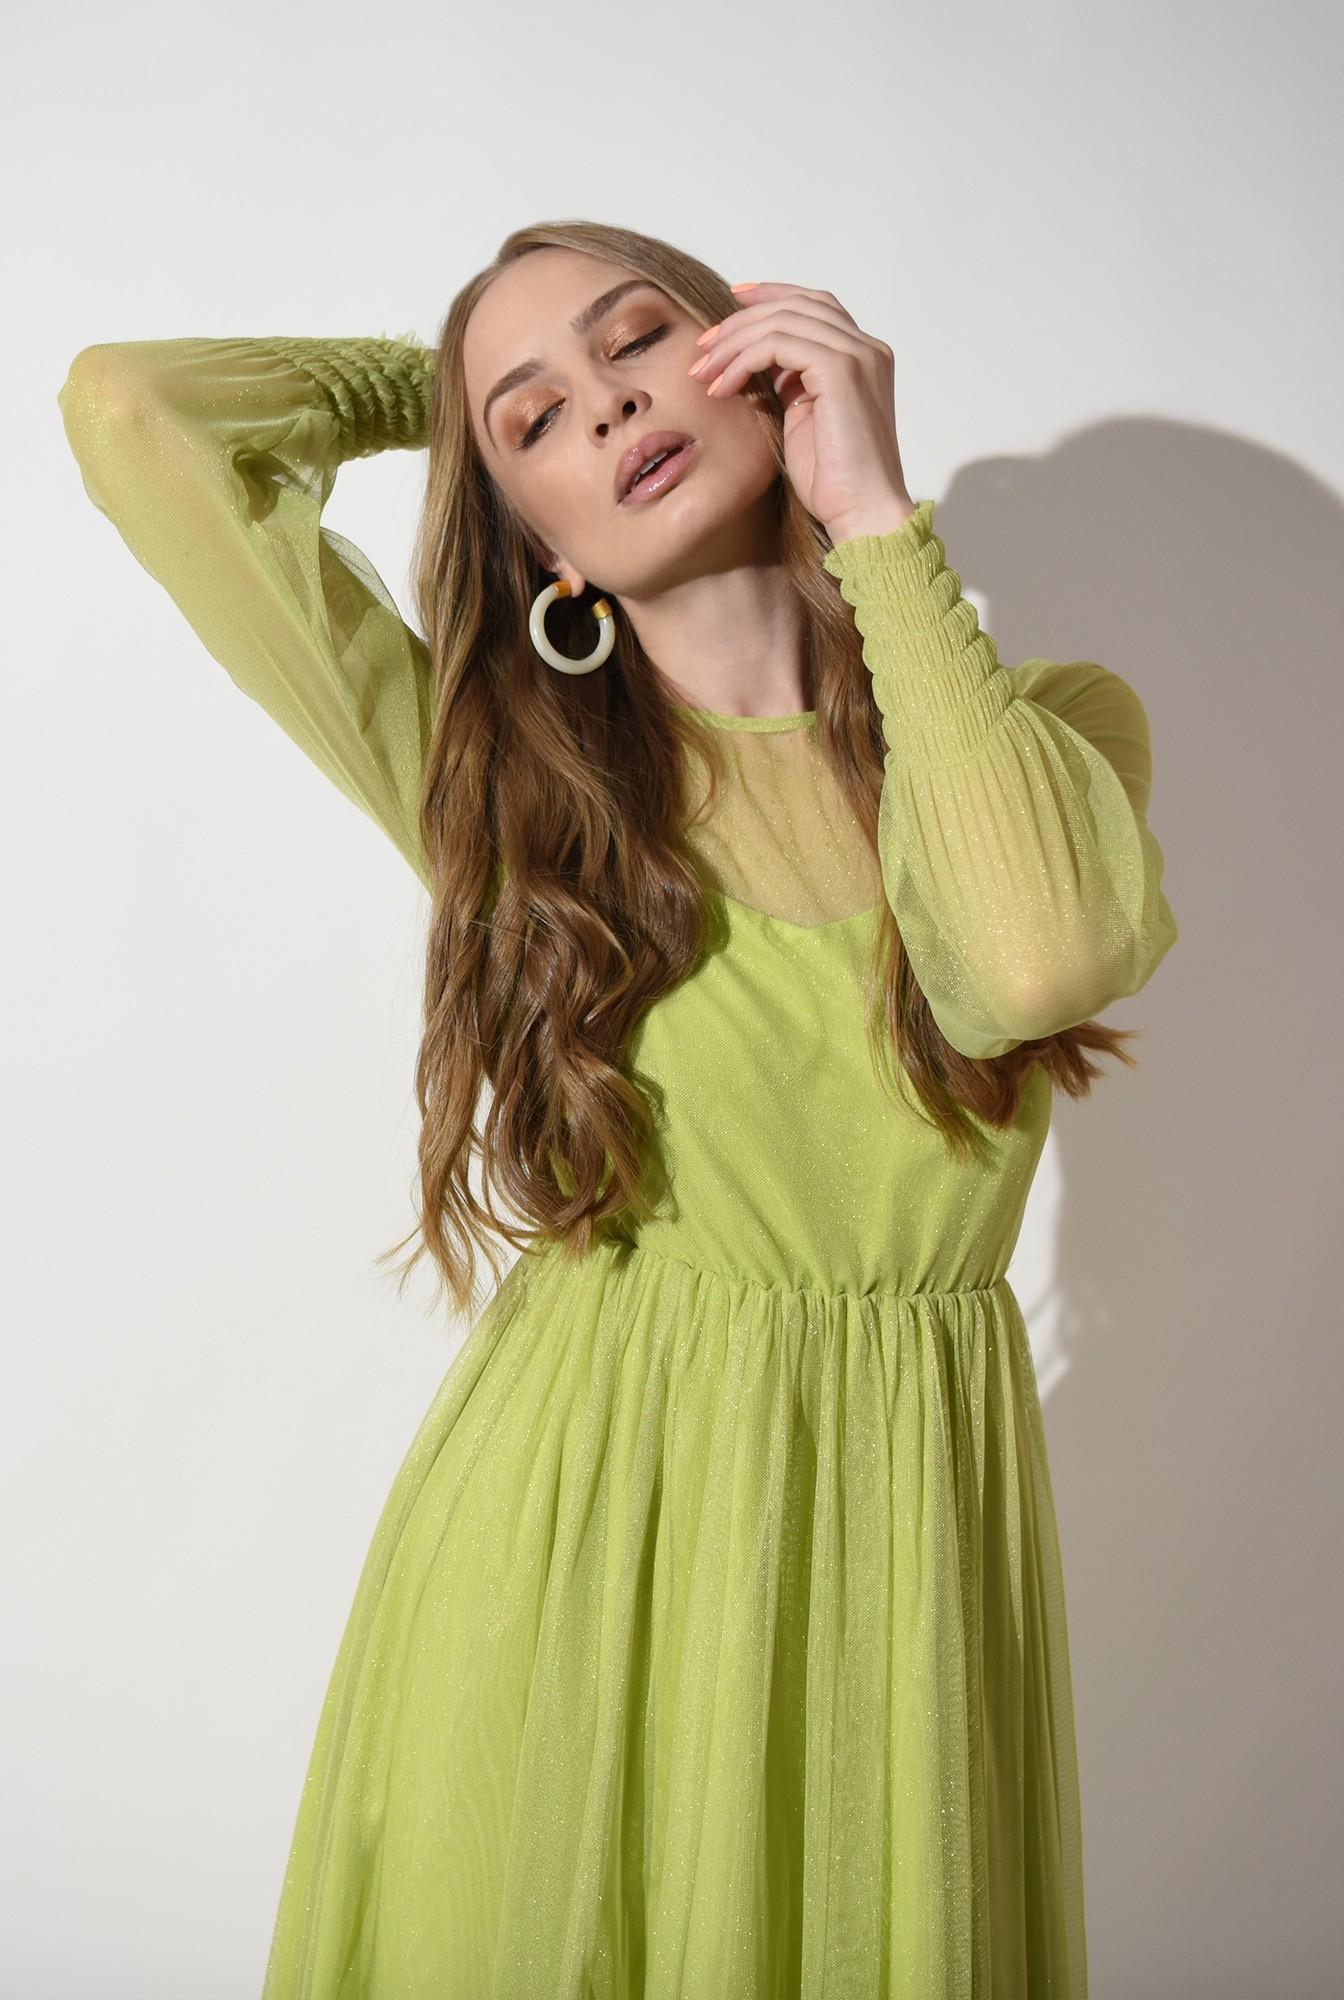 2 - rochie verde, eleganta, stransa la talie